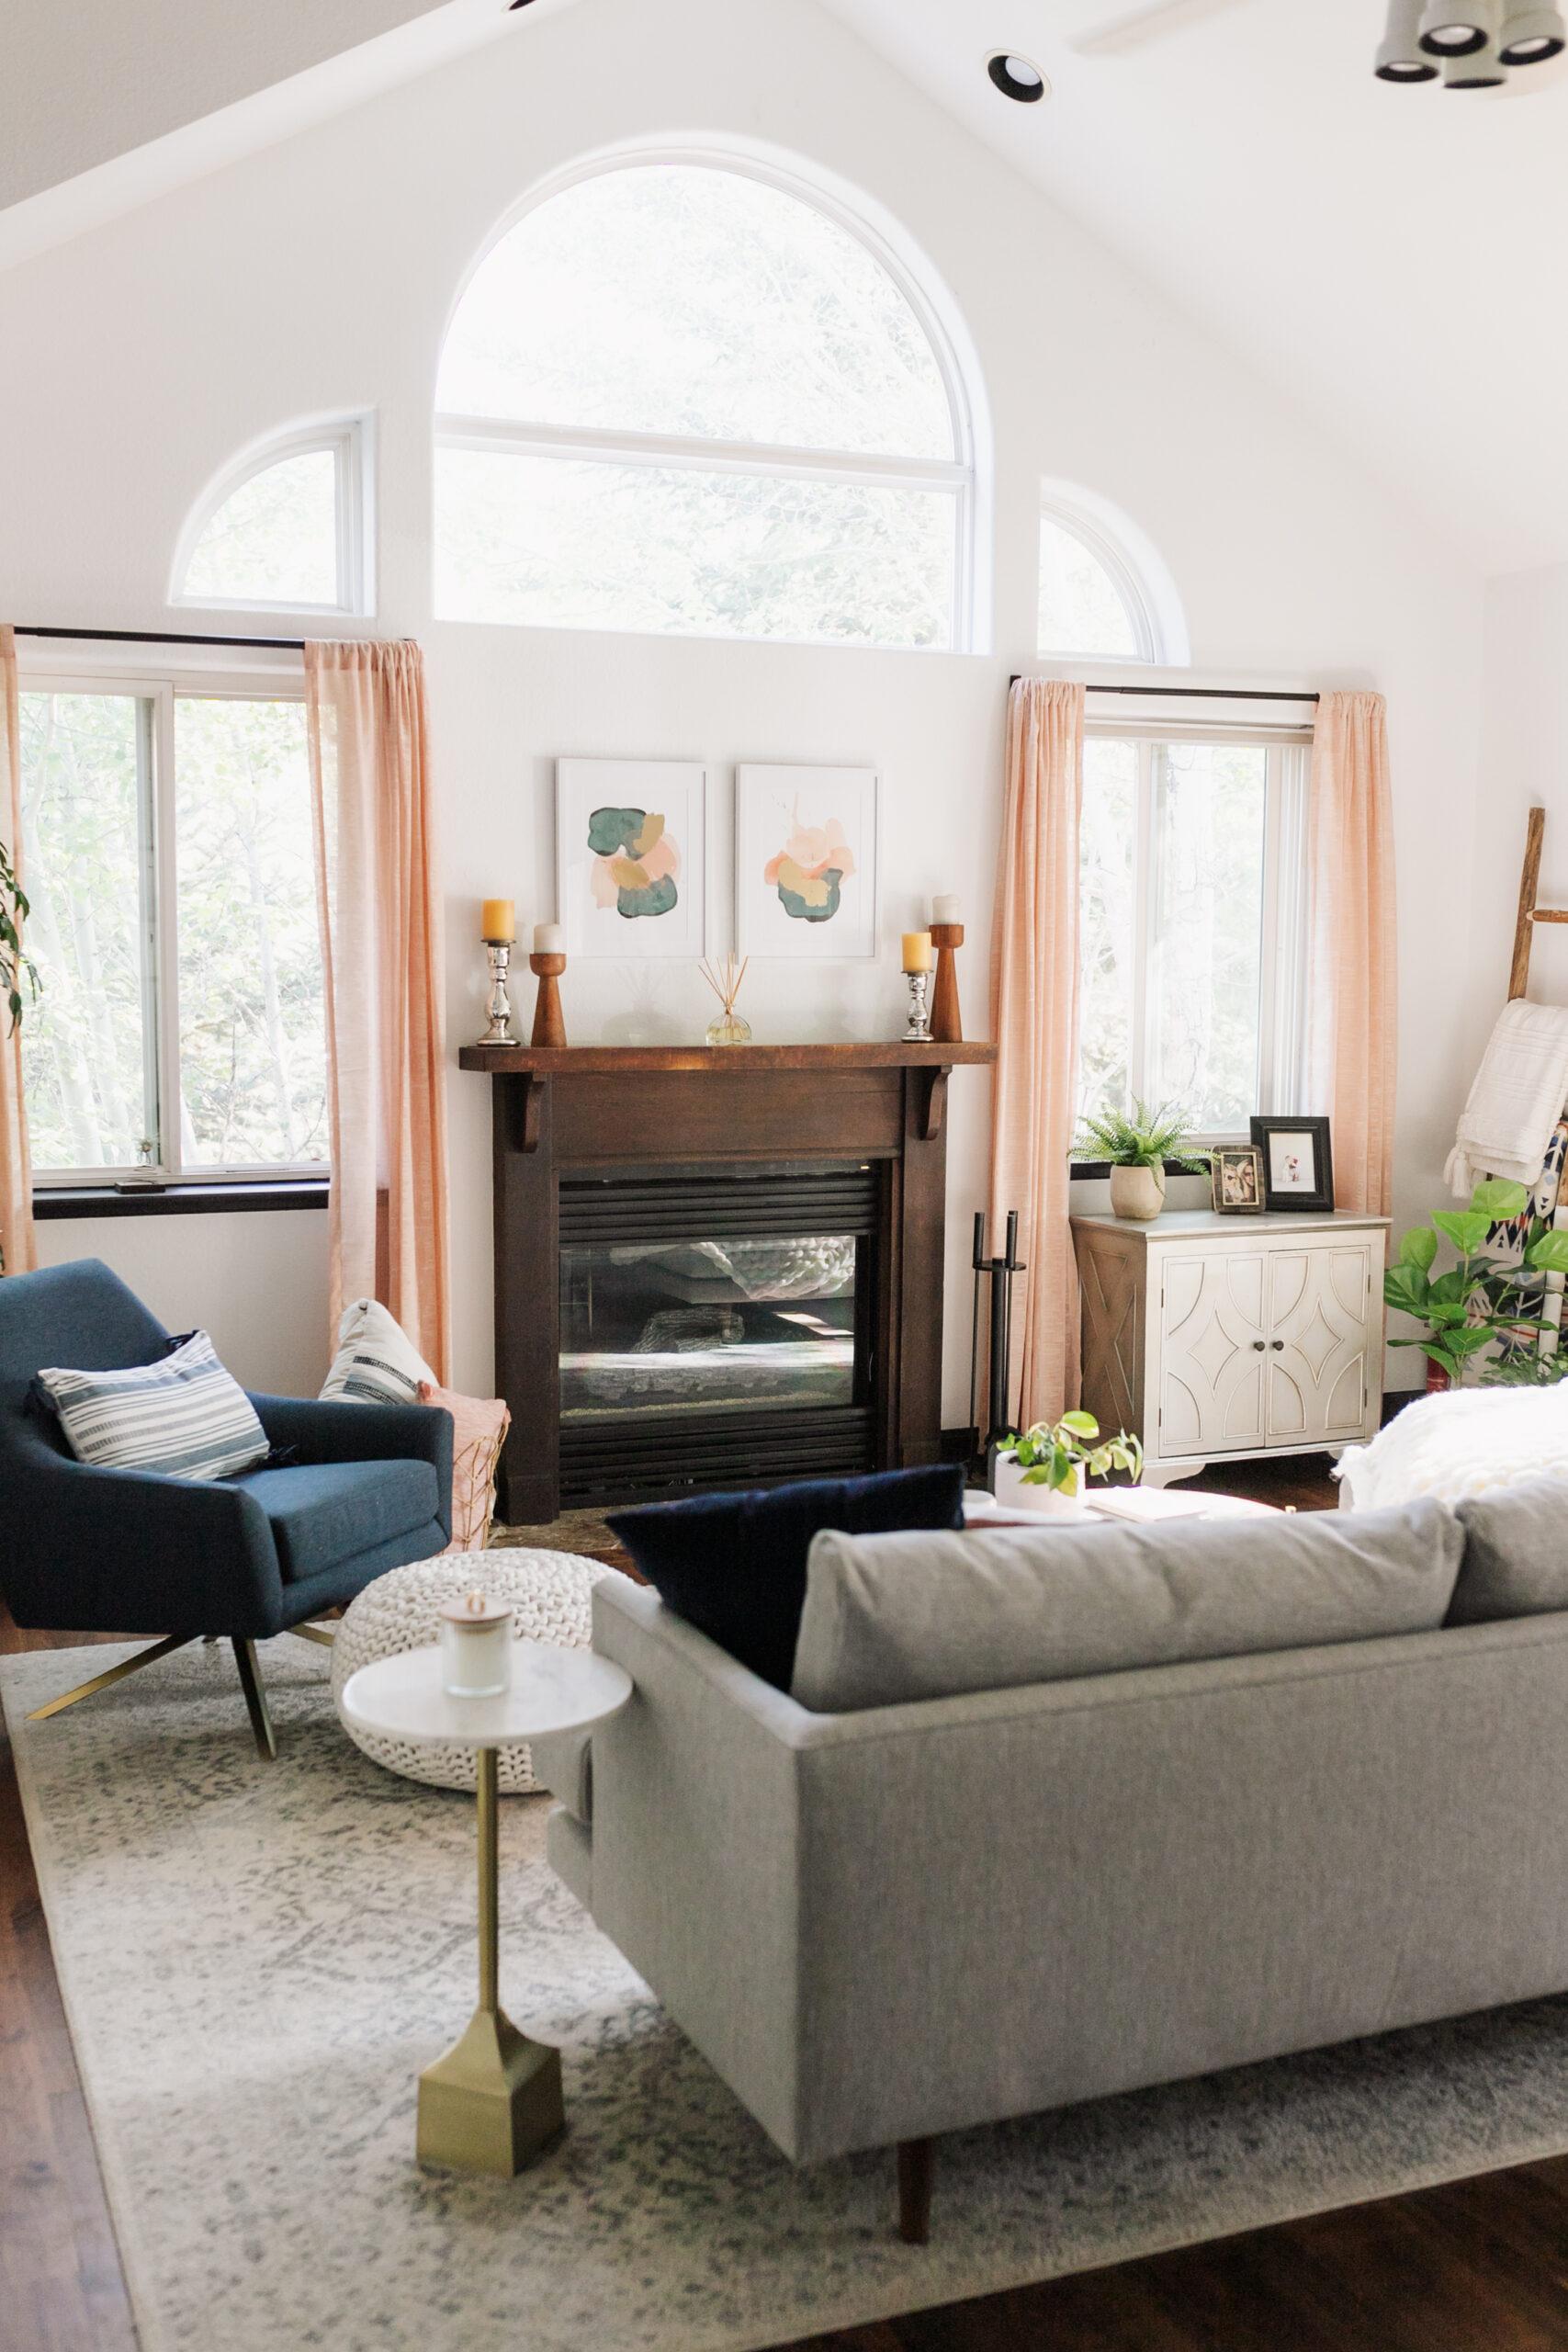 modern mountain living room is up on the blog #modernmountain #livingroom #mcm #thelovedesignedlife